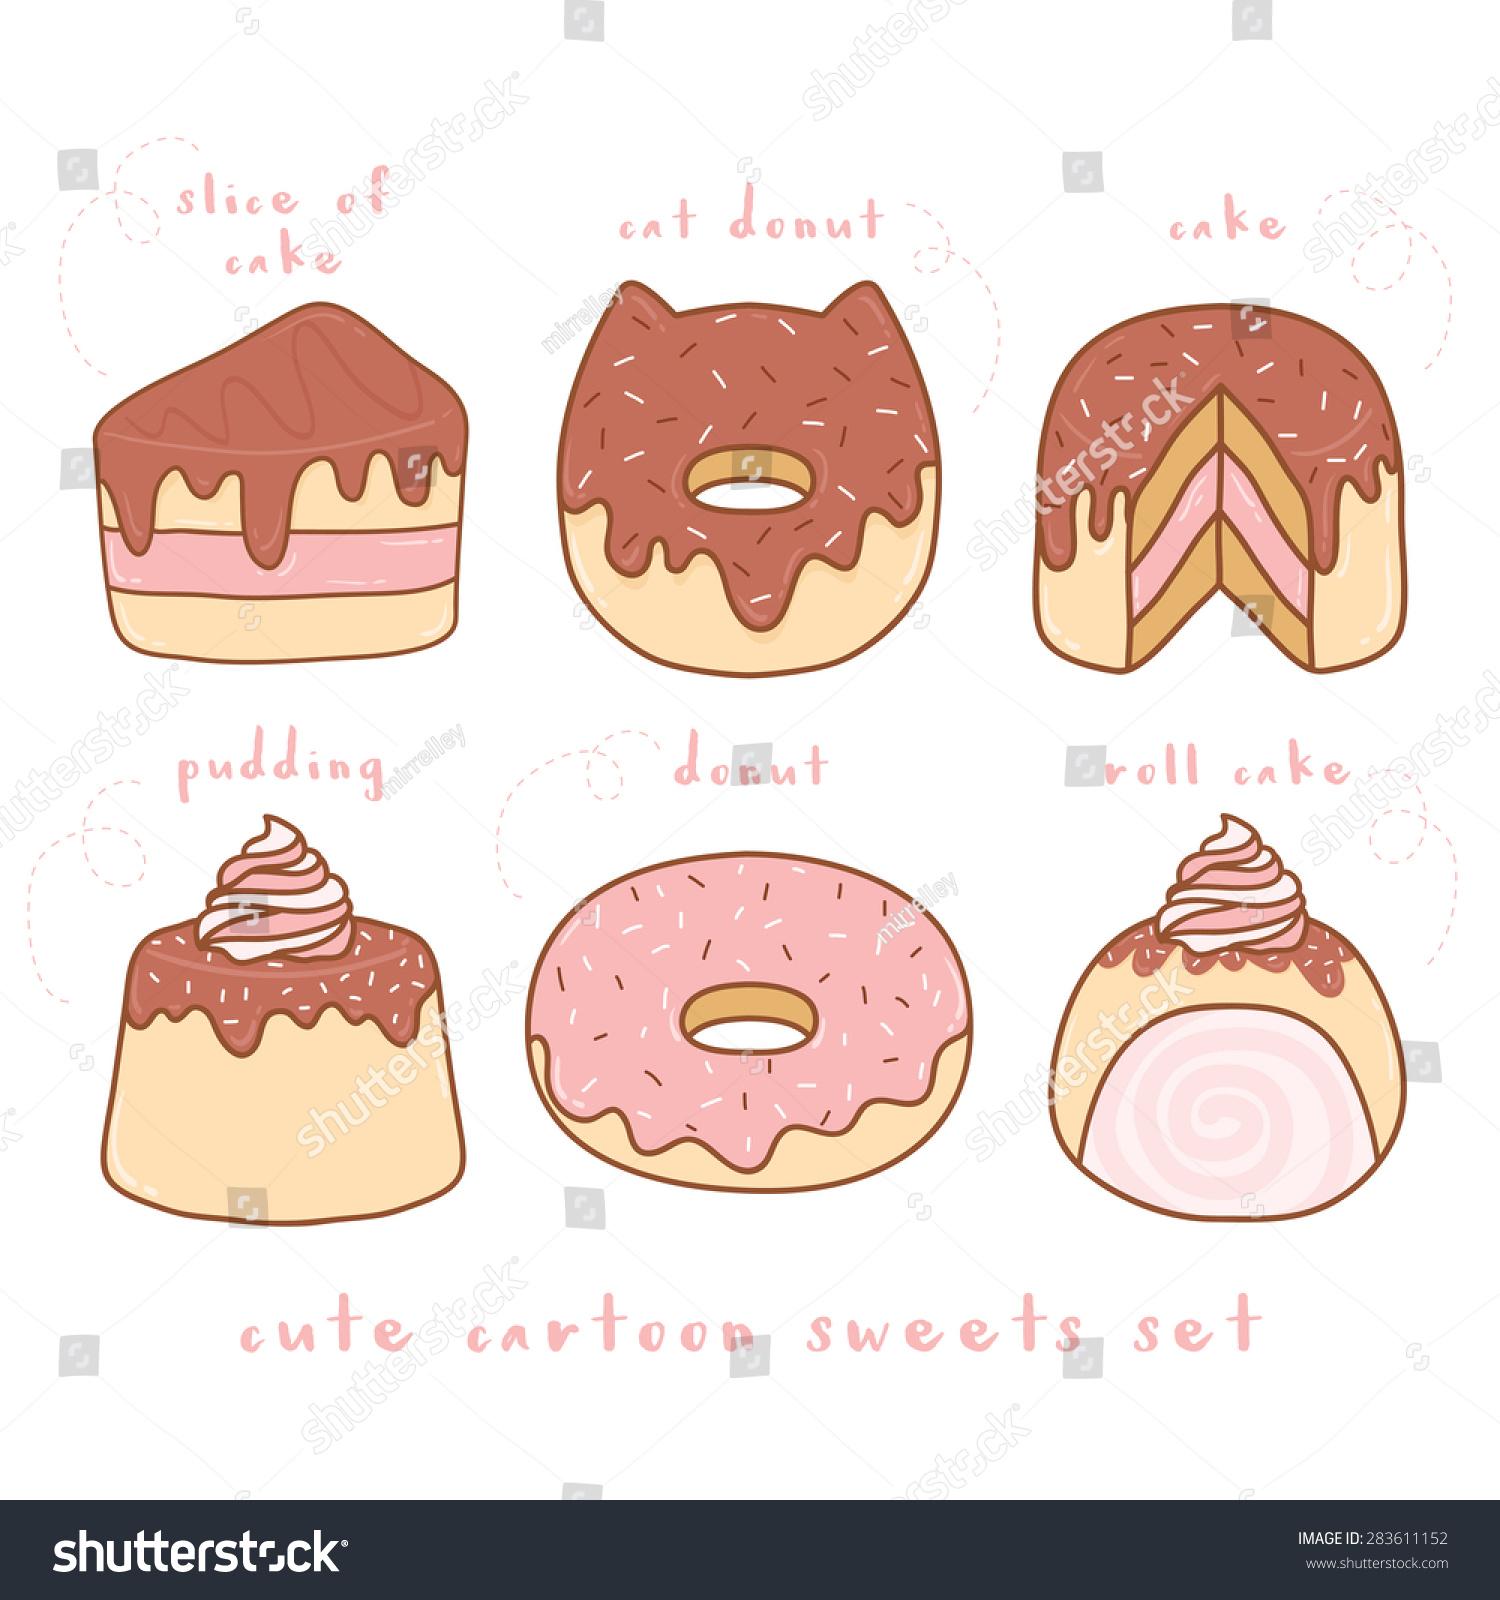 Cute Cartoon Cake Images : Cute Cartoon Sweets Set Cake Slice ????????????? 283611152 ...